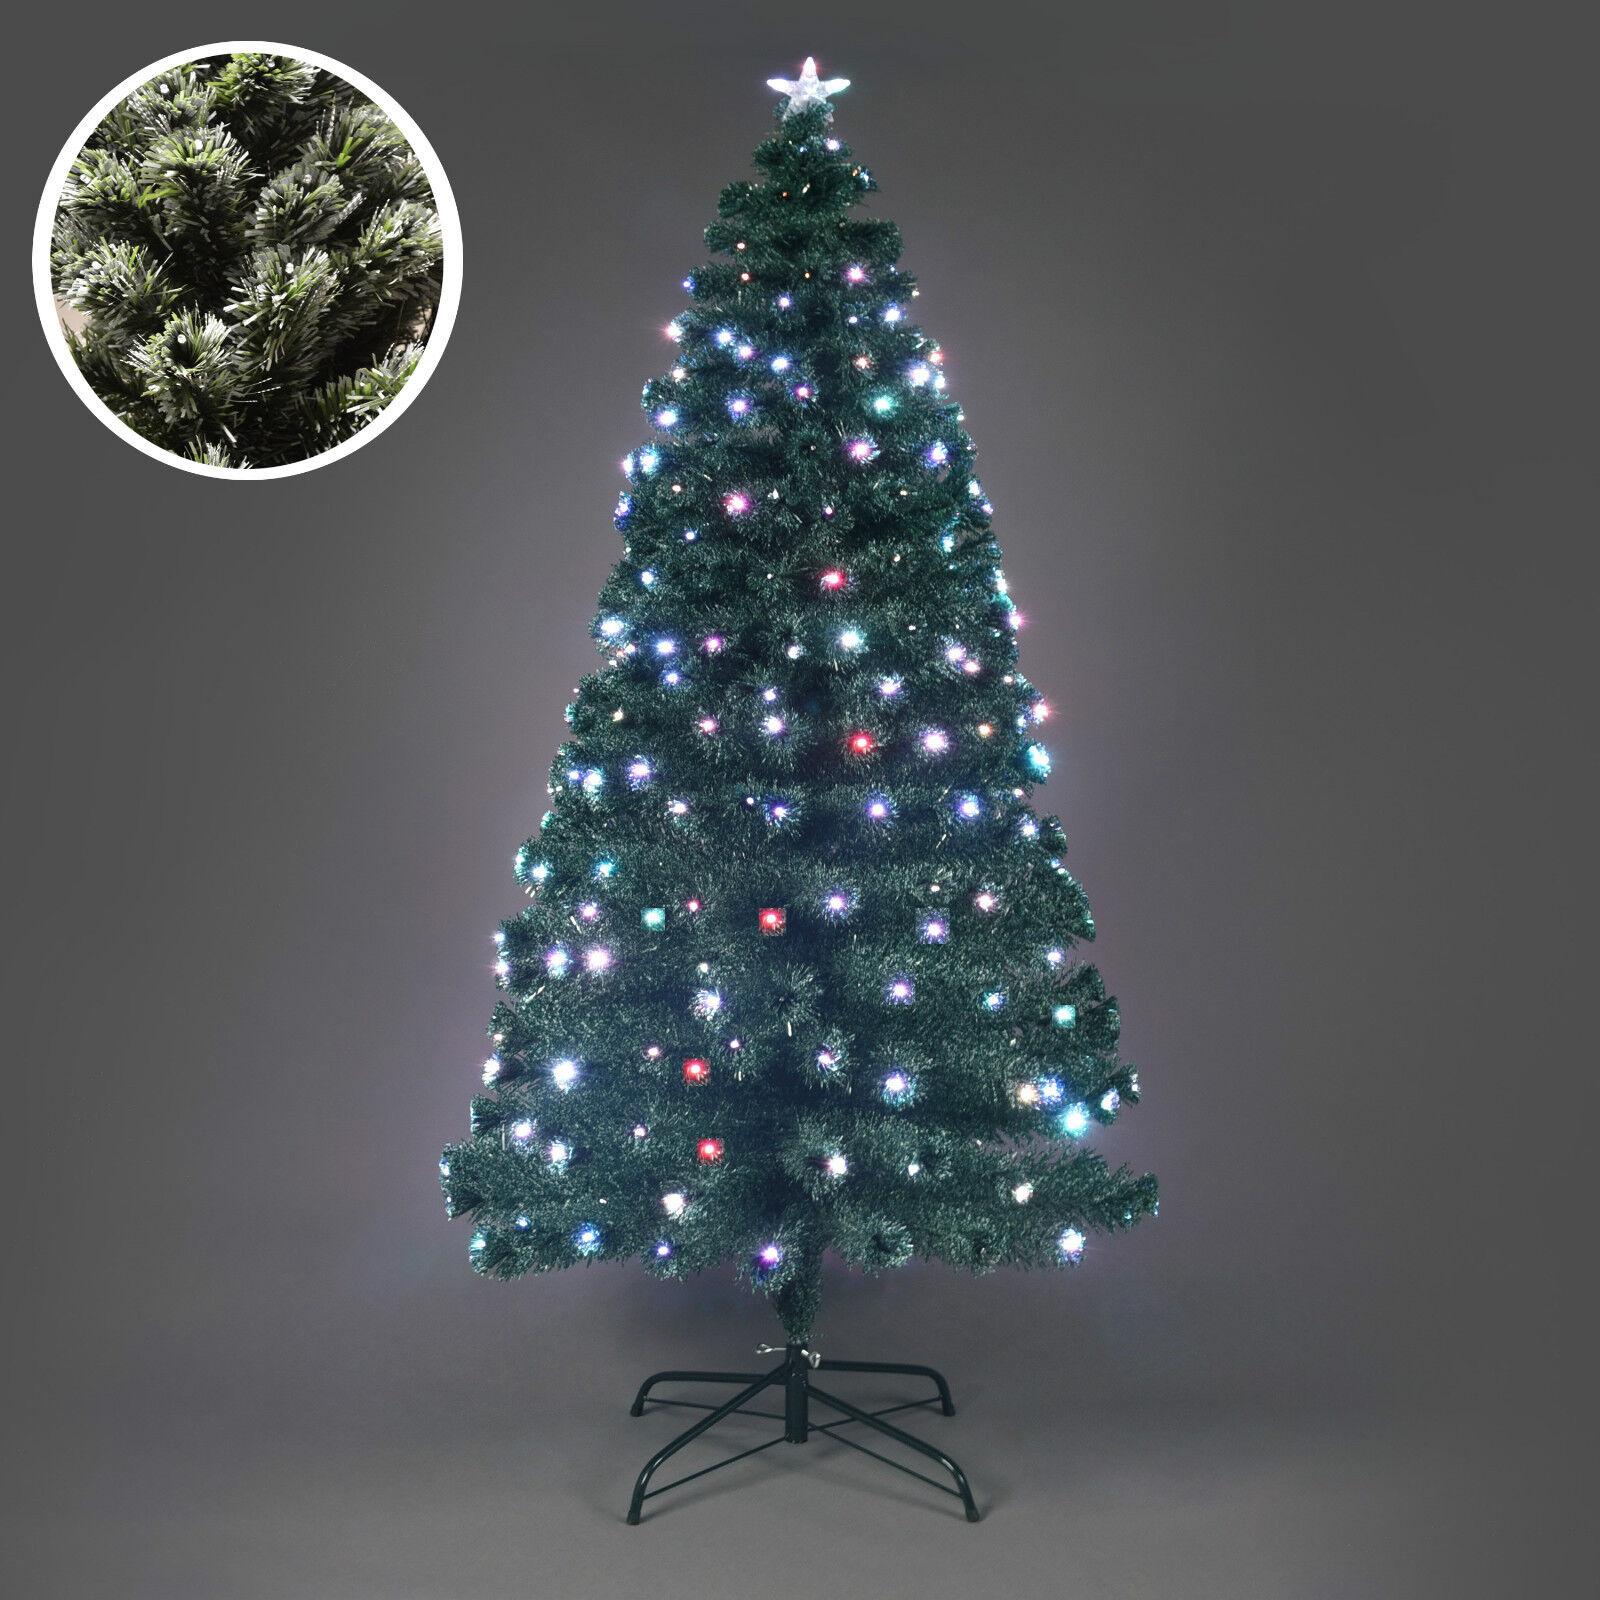 LUXURY FROSTED Grün CHRISTMAS XMAS TREE PINE FIBER OPTIC DECOR MULTIFarbe LEDS